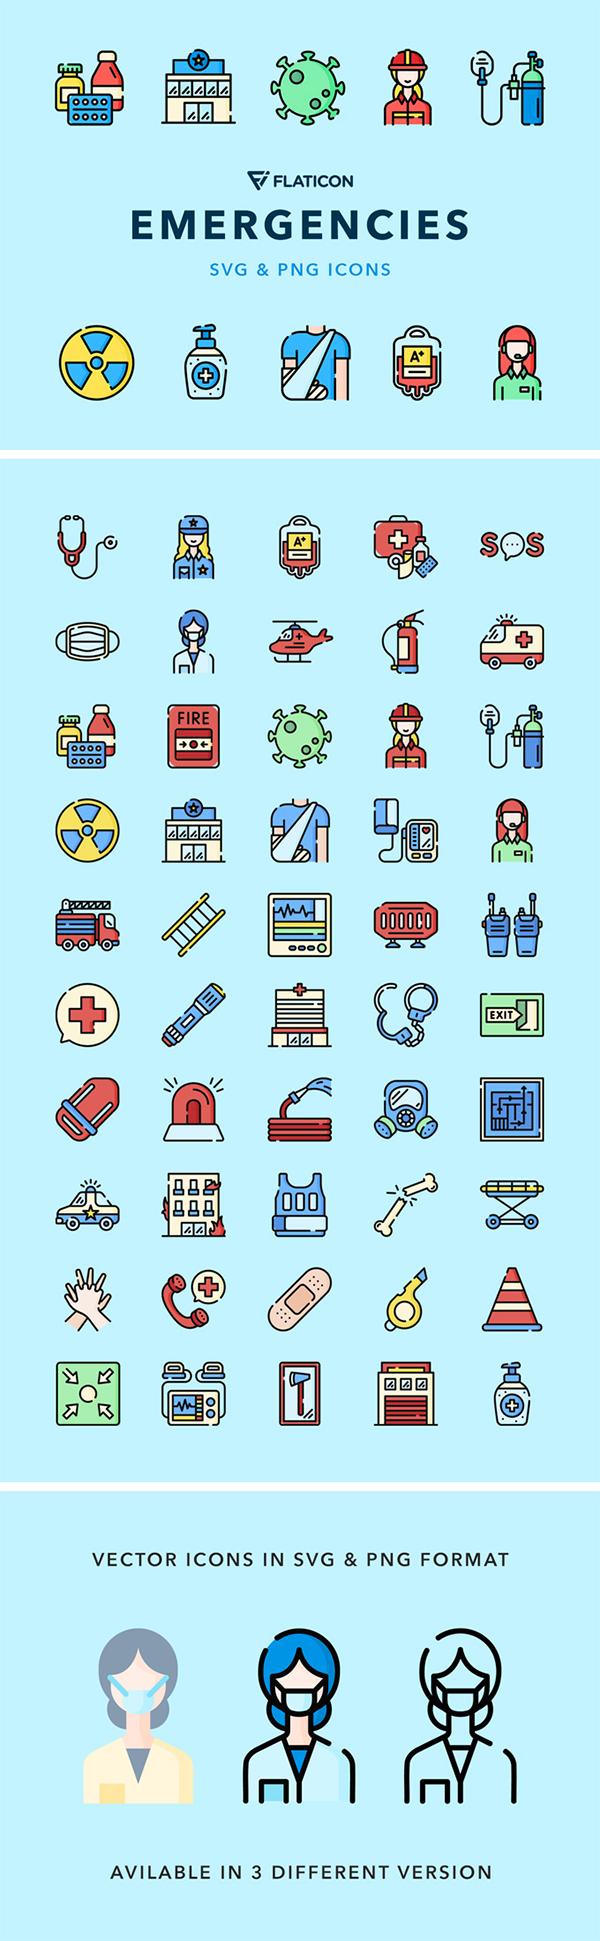 Emergencies Vector Icons